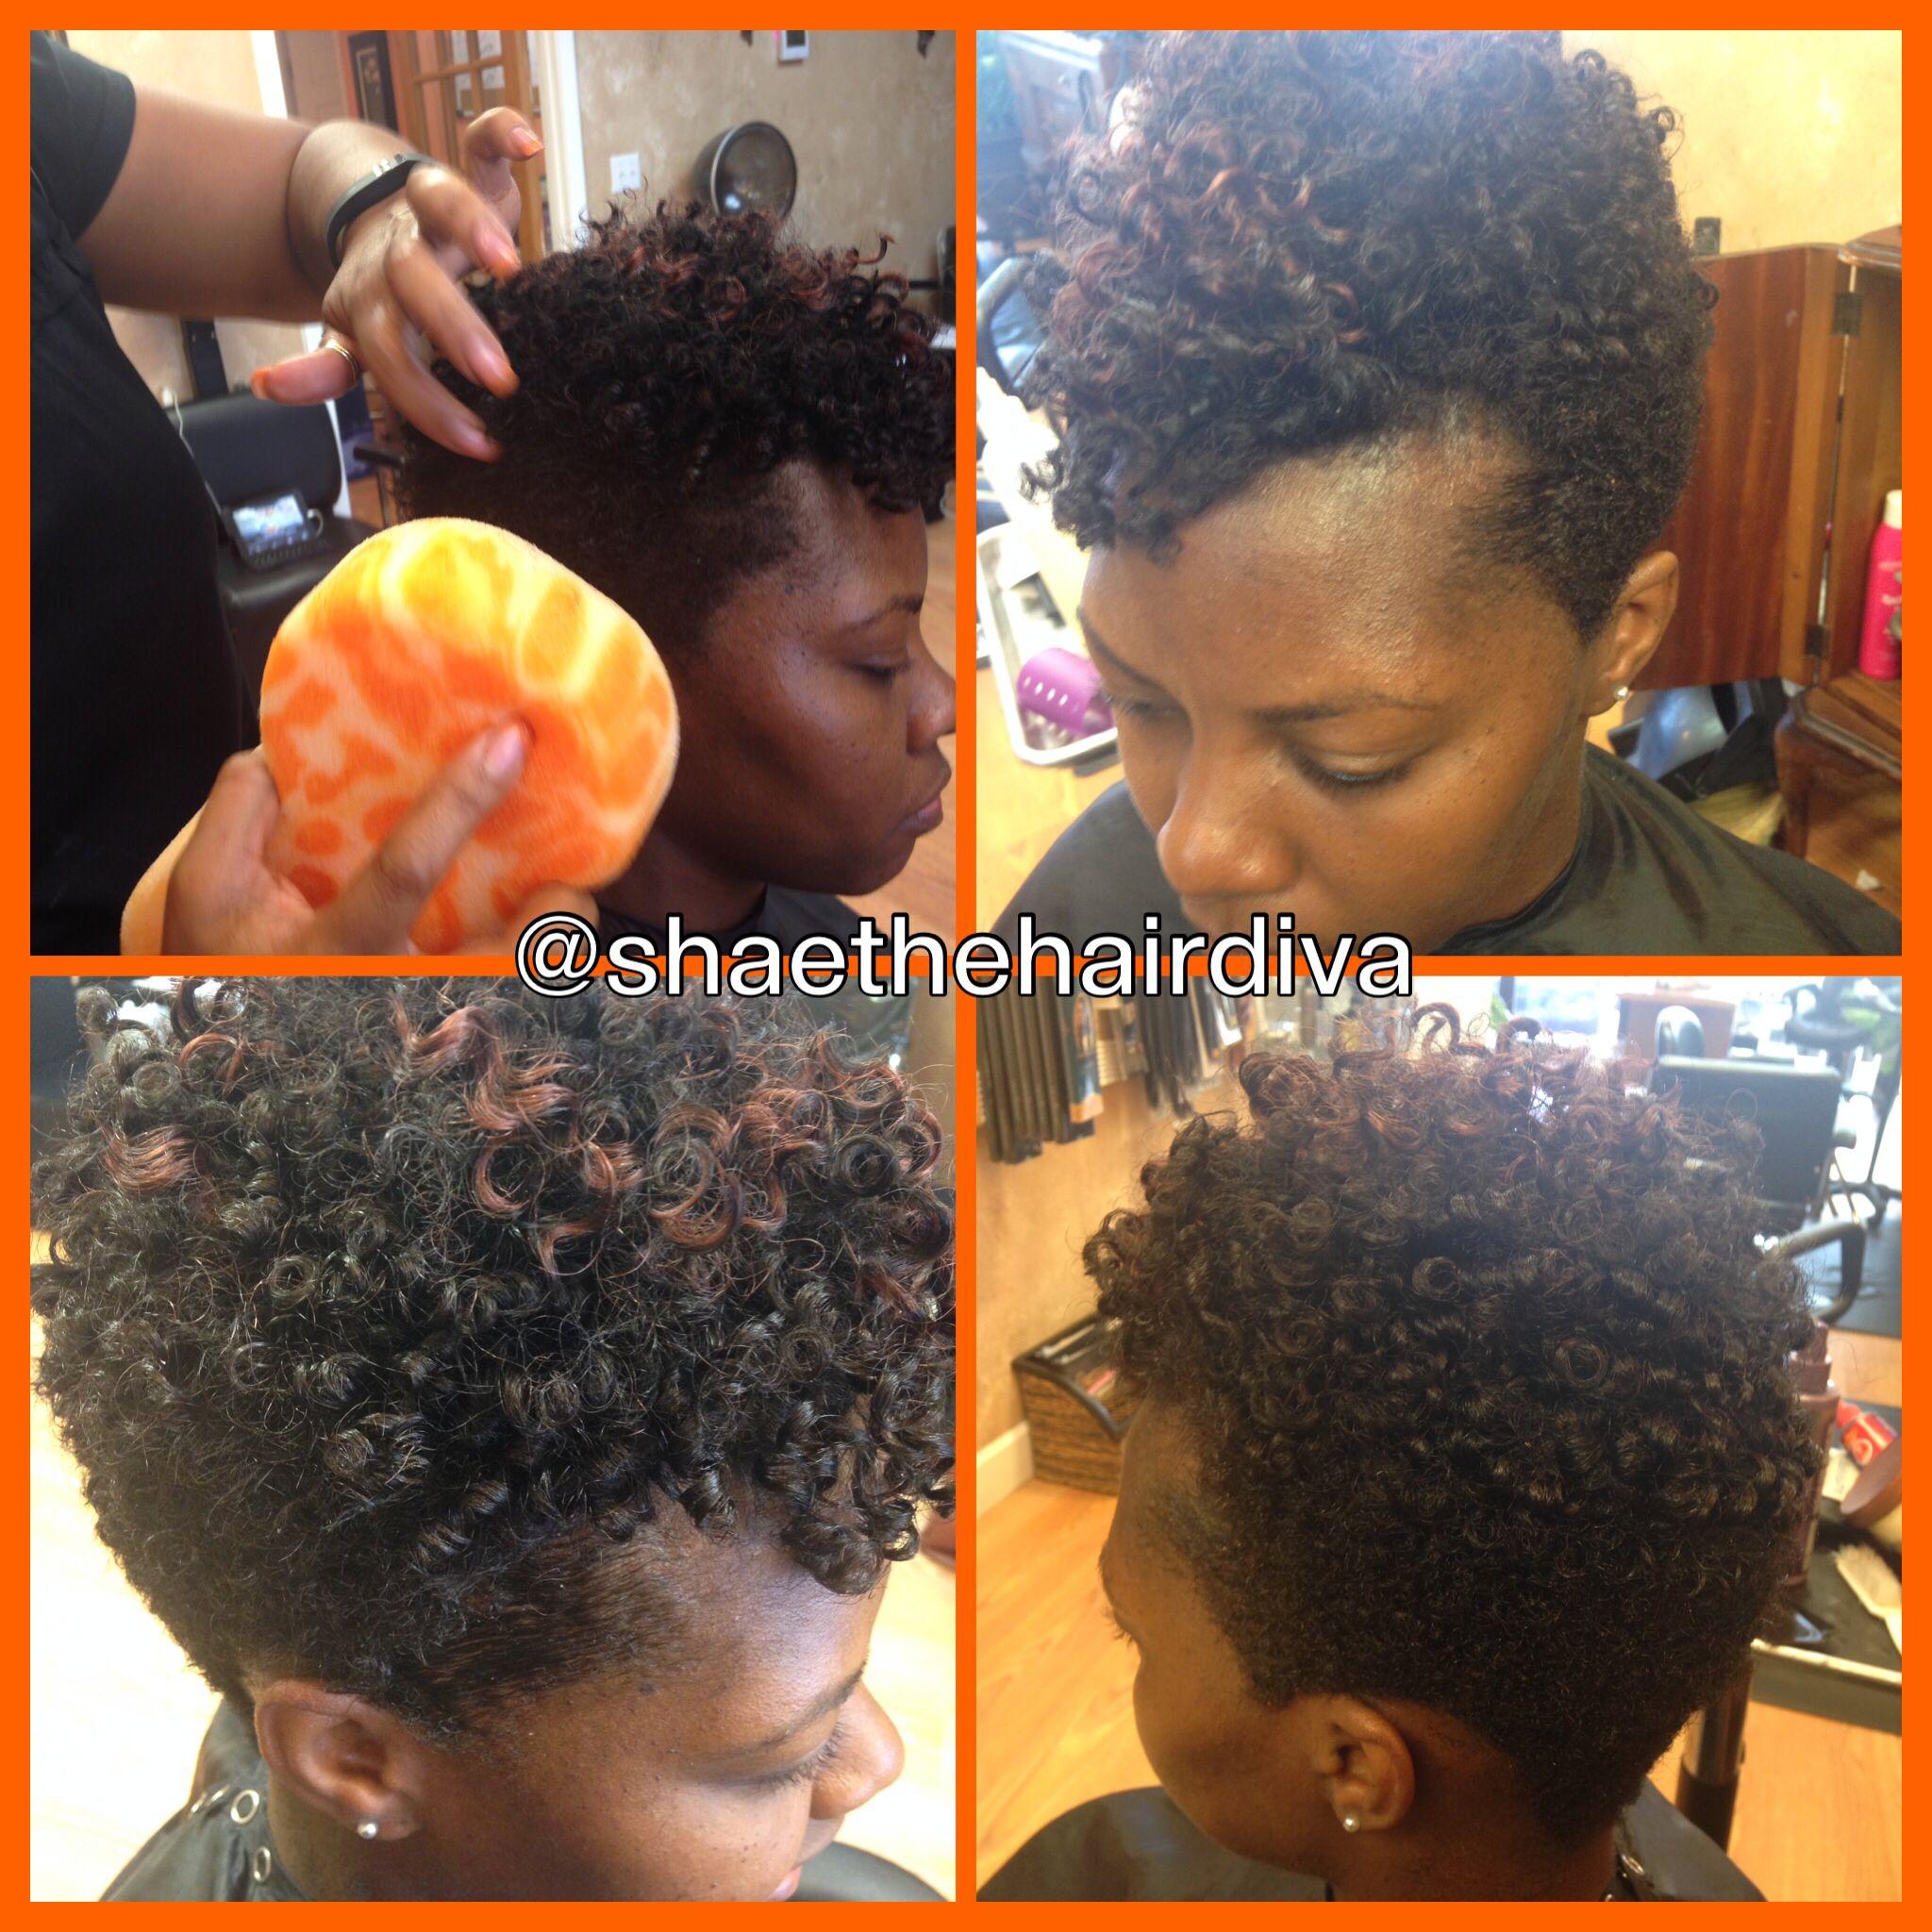 Shaethehairdiva Naturalhair Transition Faux Rodset Sponge